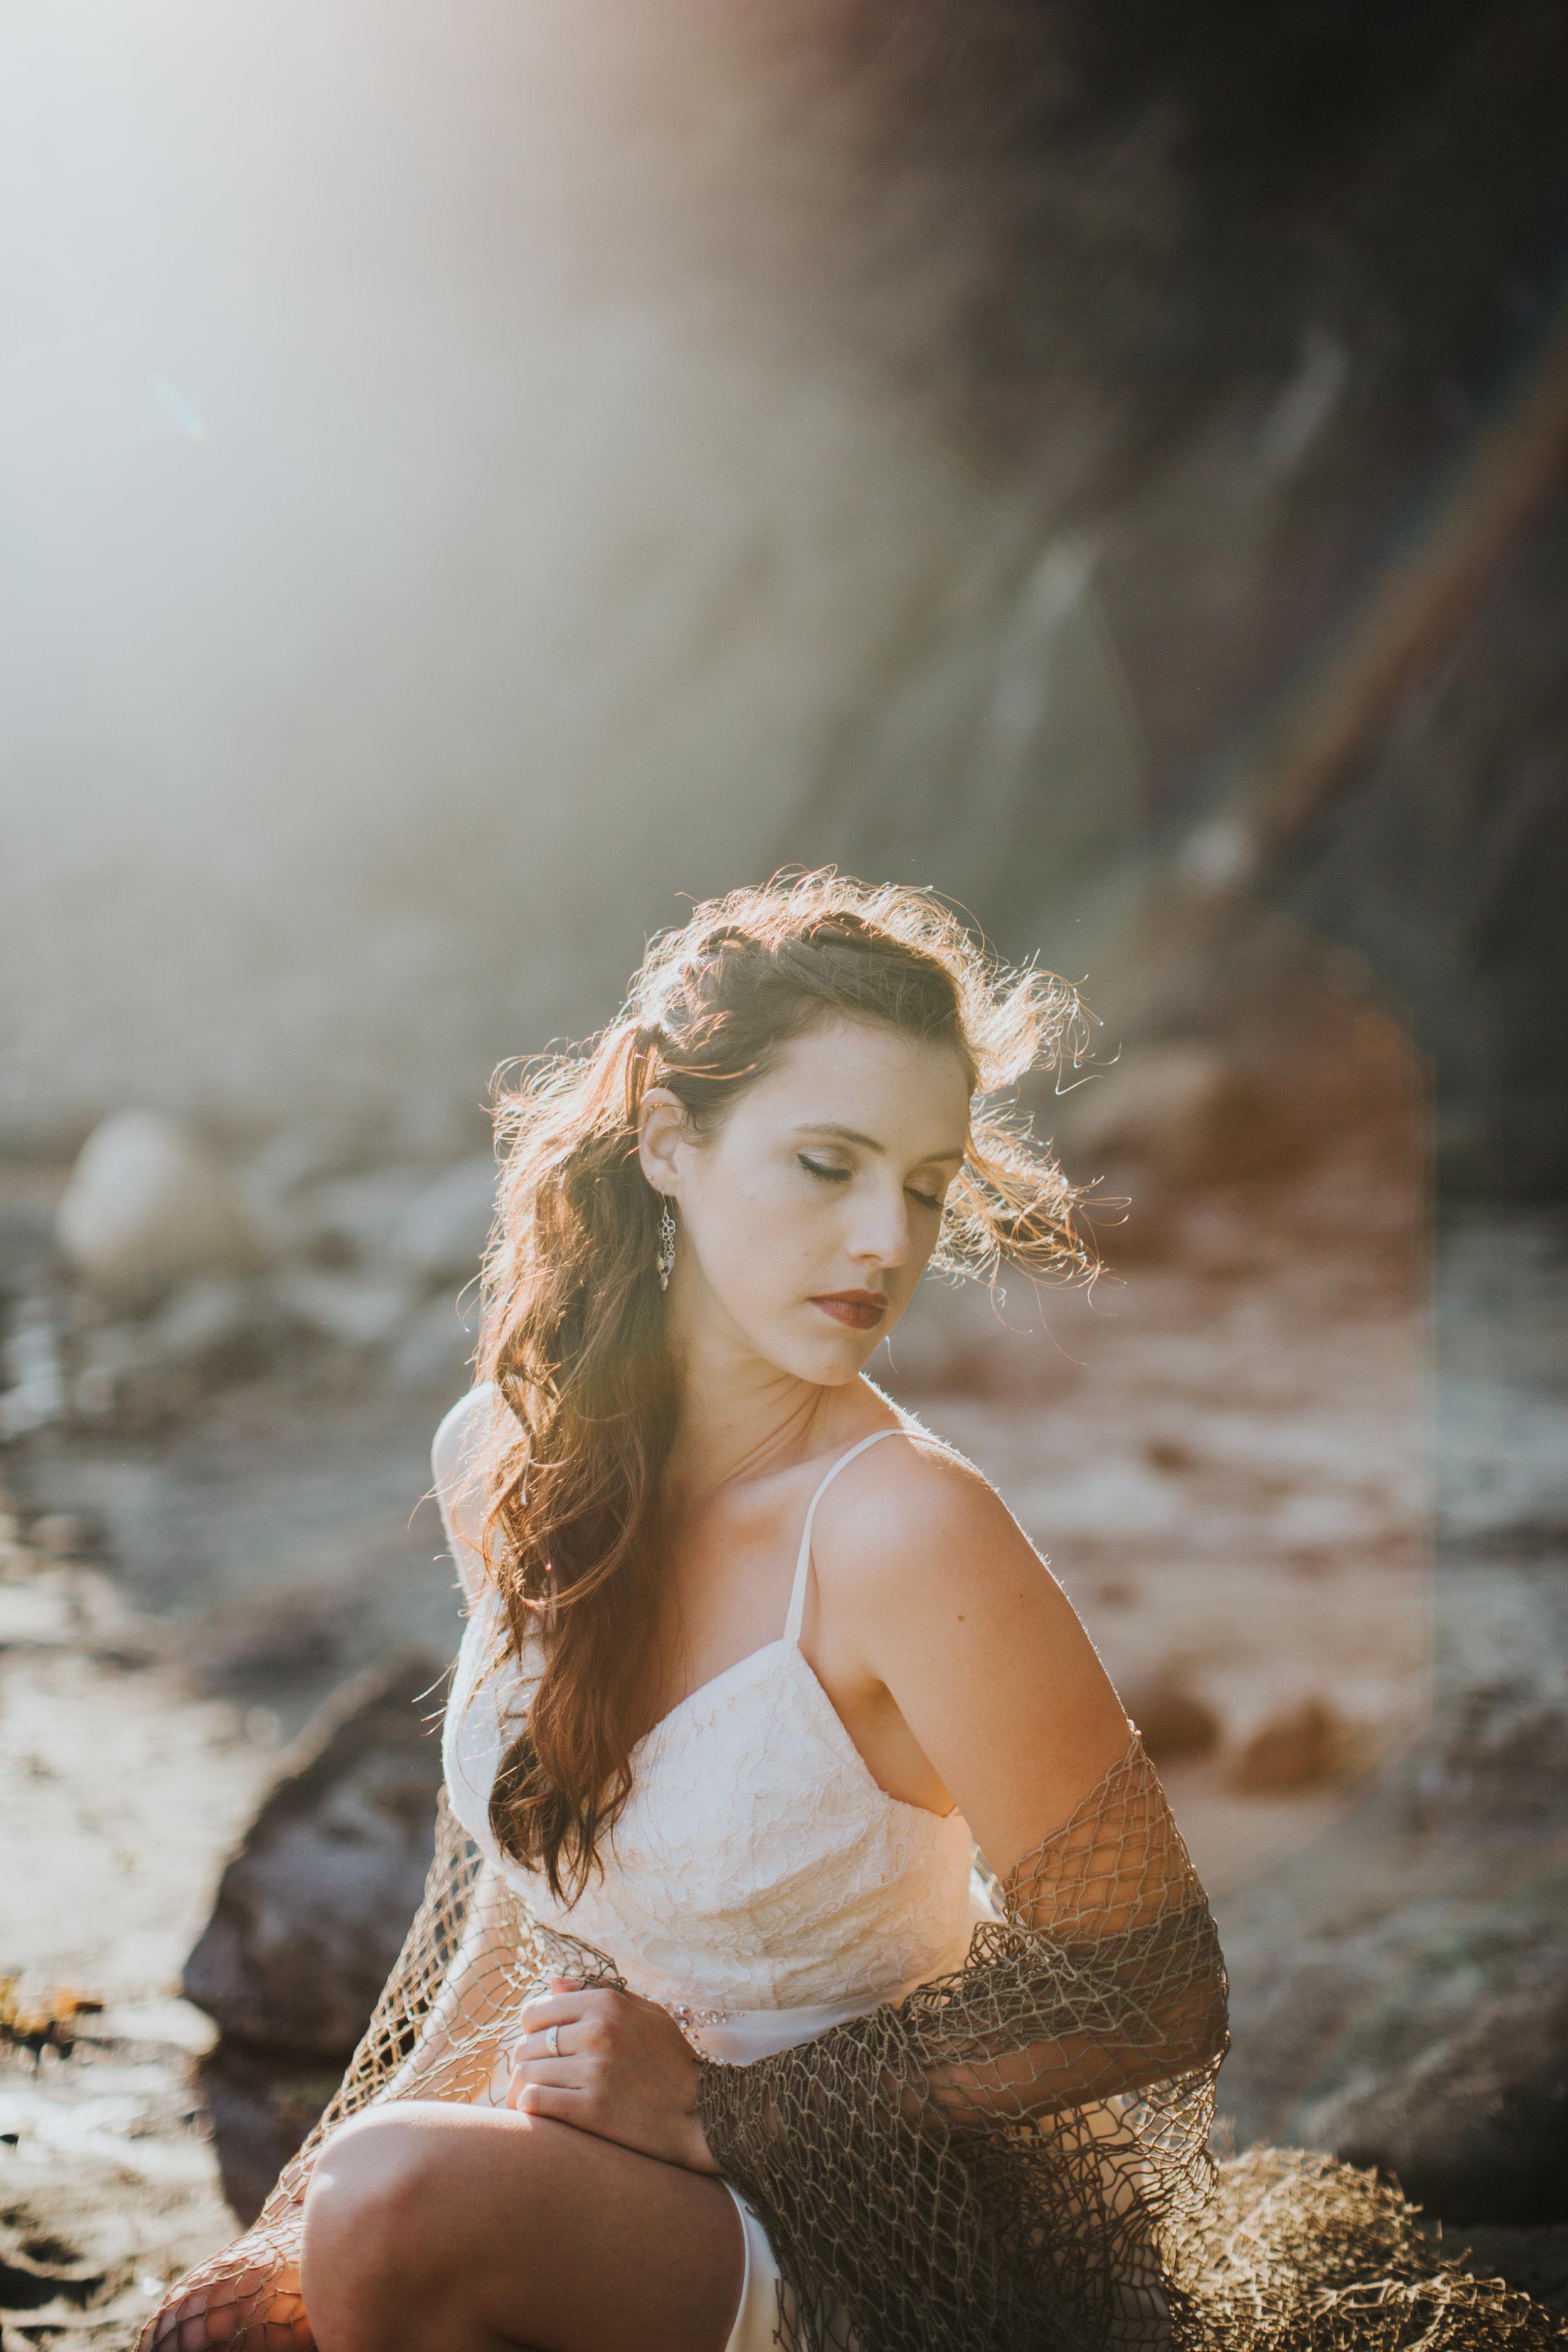 Port-Angeles-Salt-Creek-beach-wedding-bride-PNW-olympic-peninsula-photographer-Kayla-Dawn-Photography-outdoors-golden-hour-dancer-dress (31).jpg